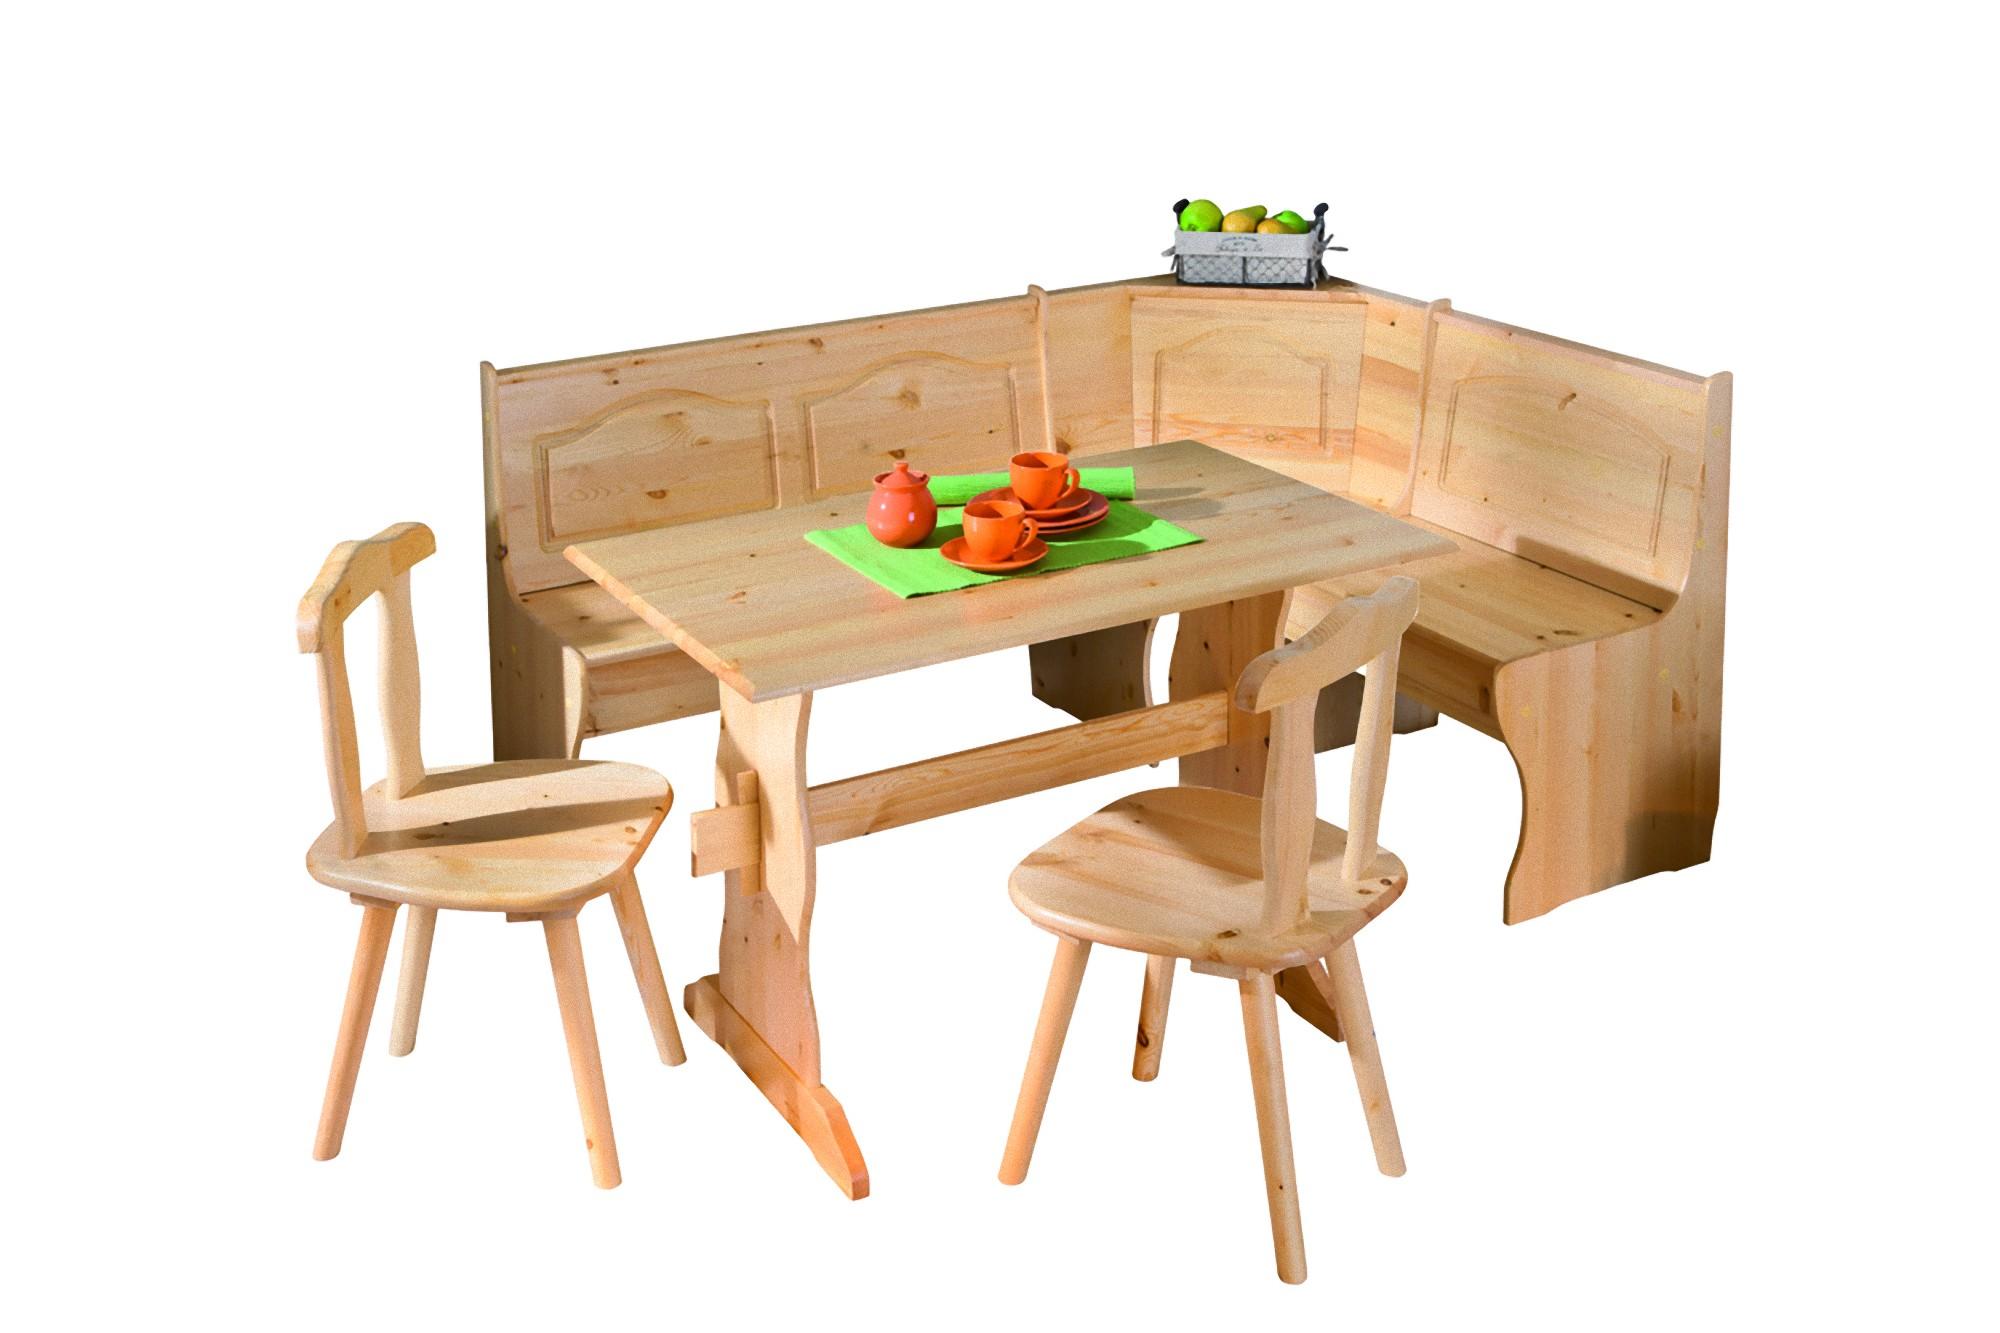 Holz Landhaus Sitzgruppe Tidor Eckbank natur Küche Esszimmer Küche  Essgruppe  dynamic-16.de